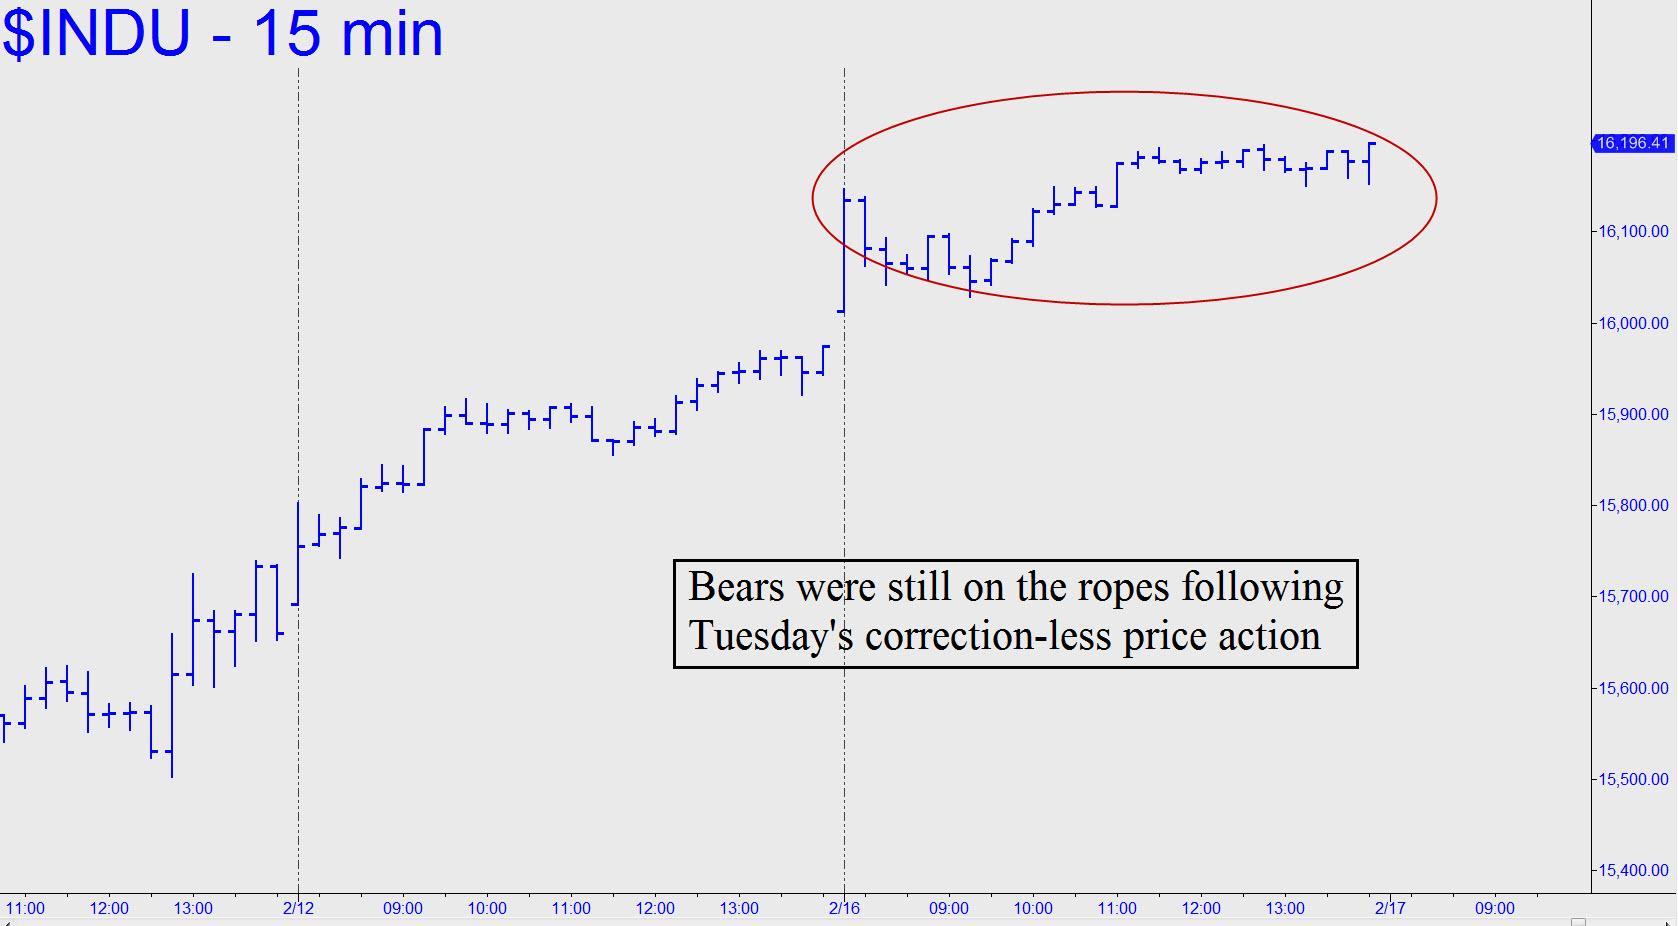 http://www.rickackerman.com/wp-content/uploads/2016/02/Bears-were-still.jpg